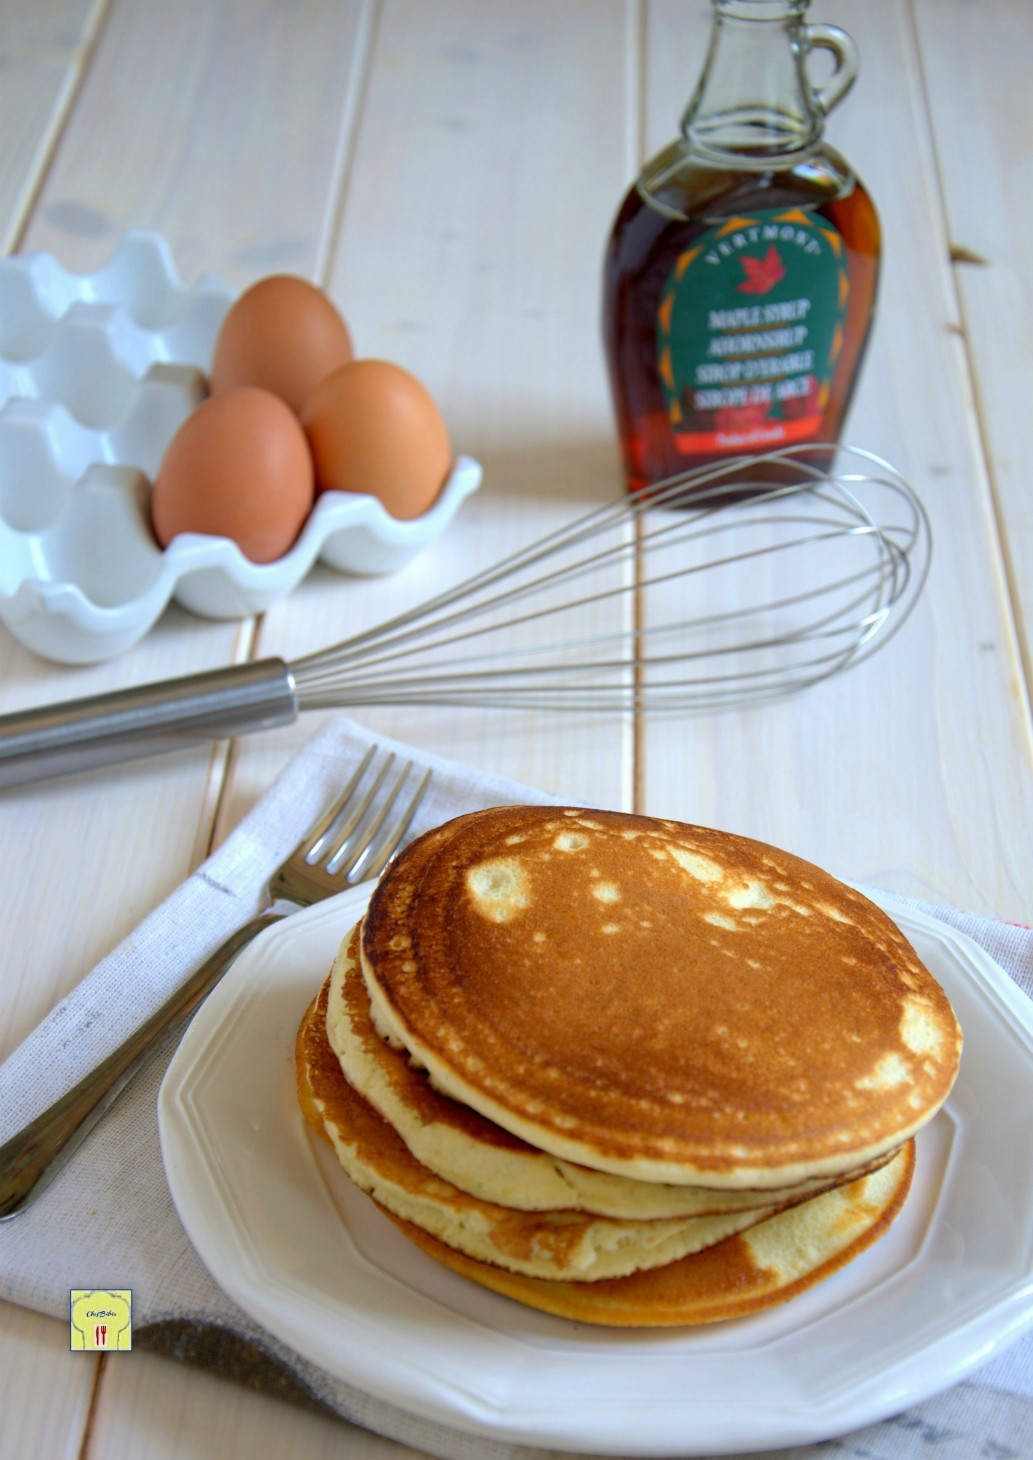 Ricetta Pancake Americani Giallo Zafferano.Pancakes Ricetta Pancakes Soffici Facile E Veloce Senza Burro